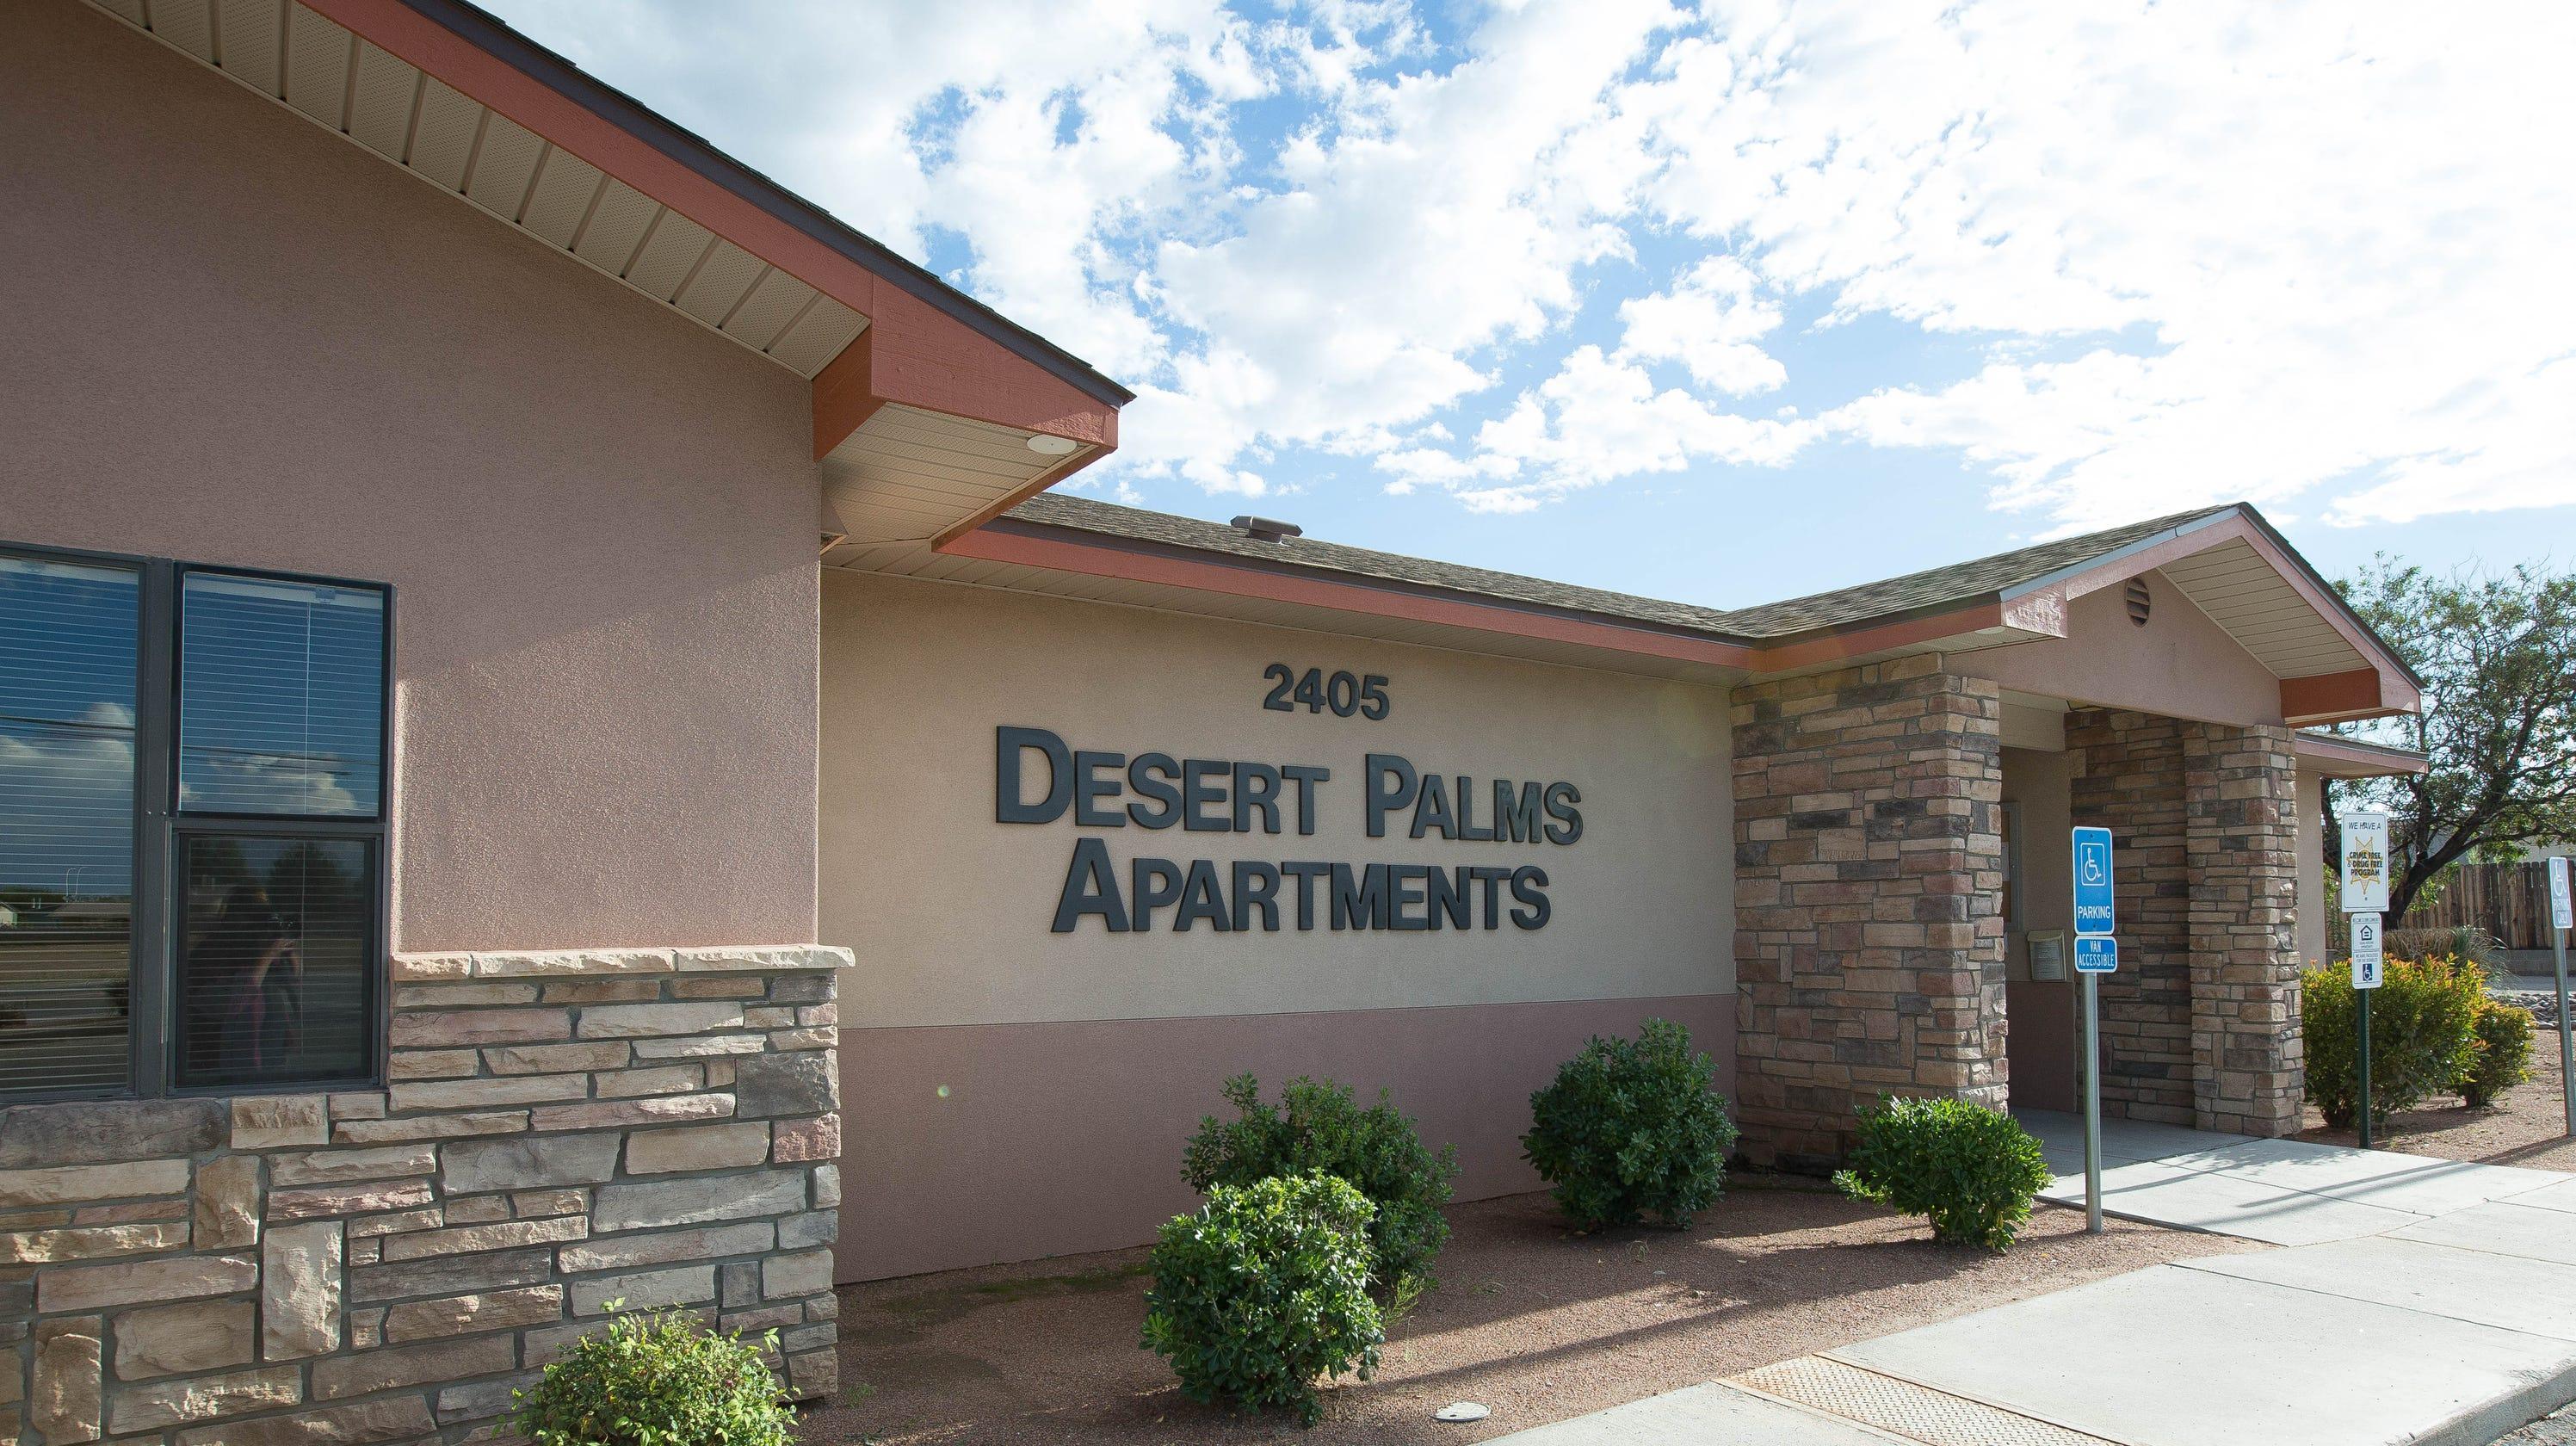 Lawsuit Filed Against Desert Palms Apartments Alleges Bed Bug Infestation